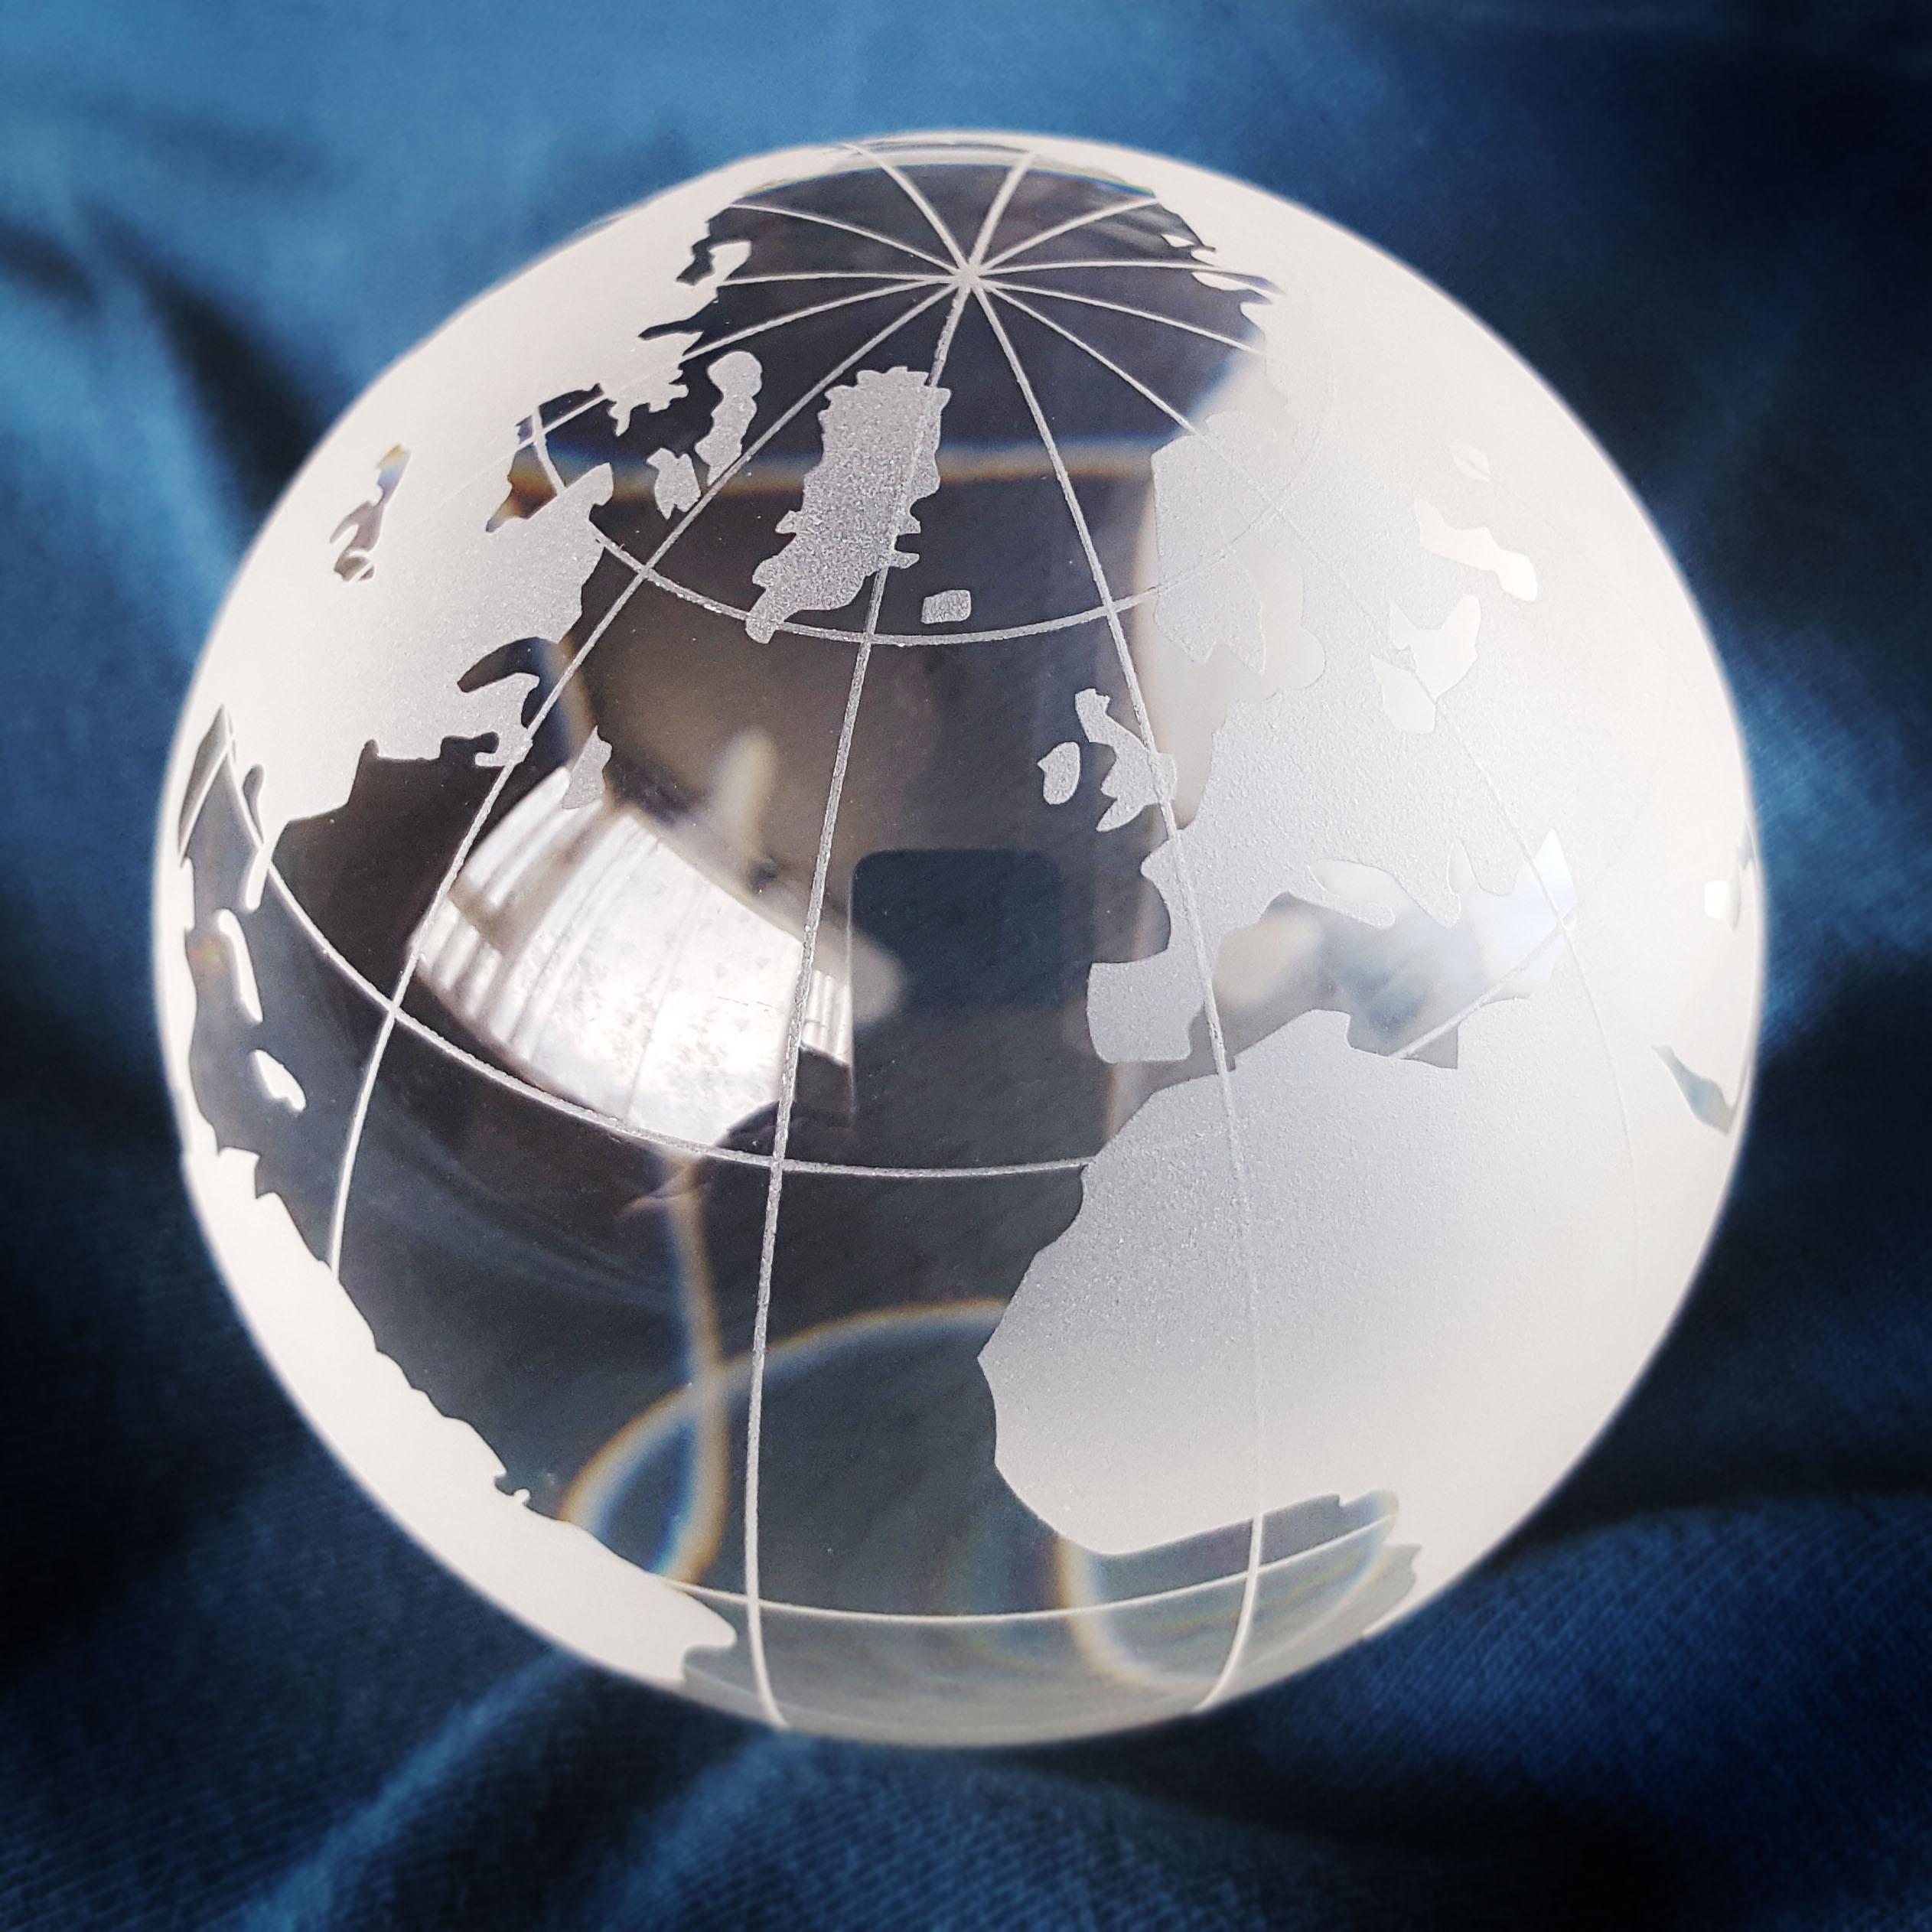 Plastic - Polluting Our Oceans - Earth - the last krystallos